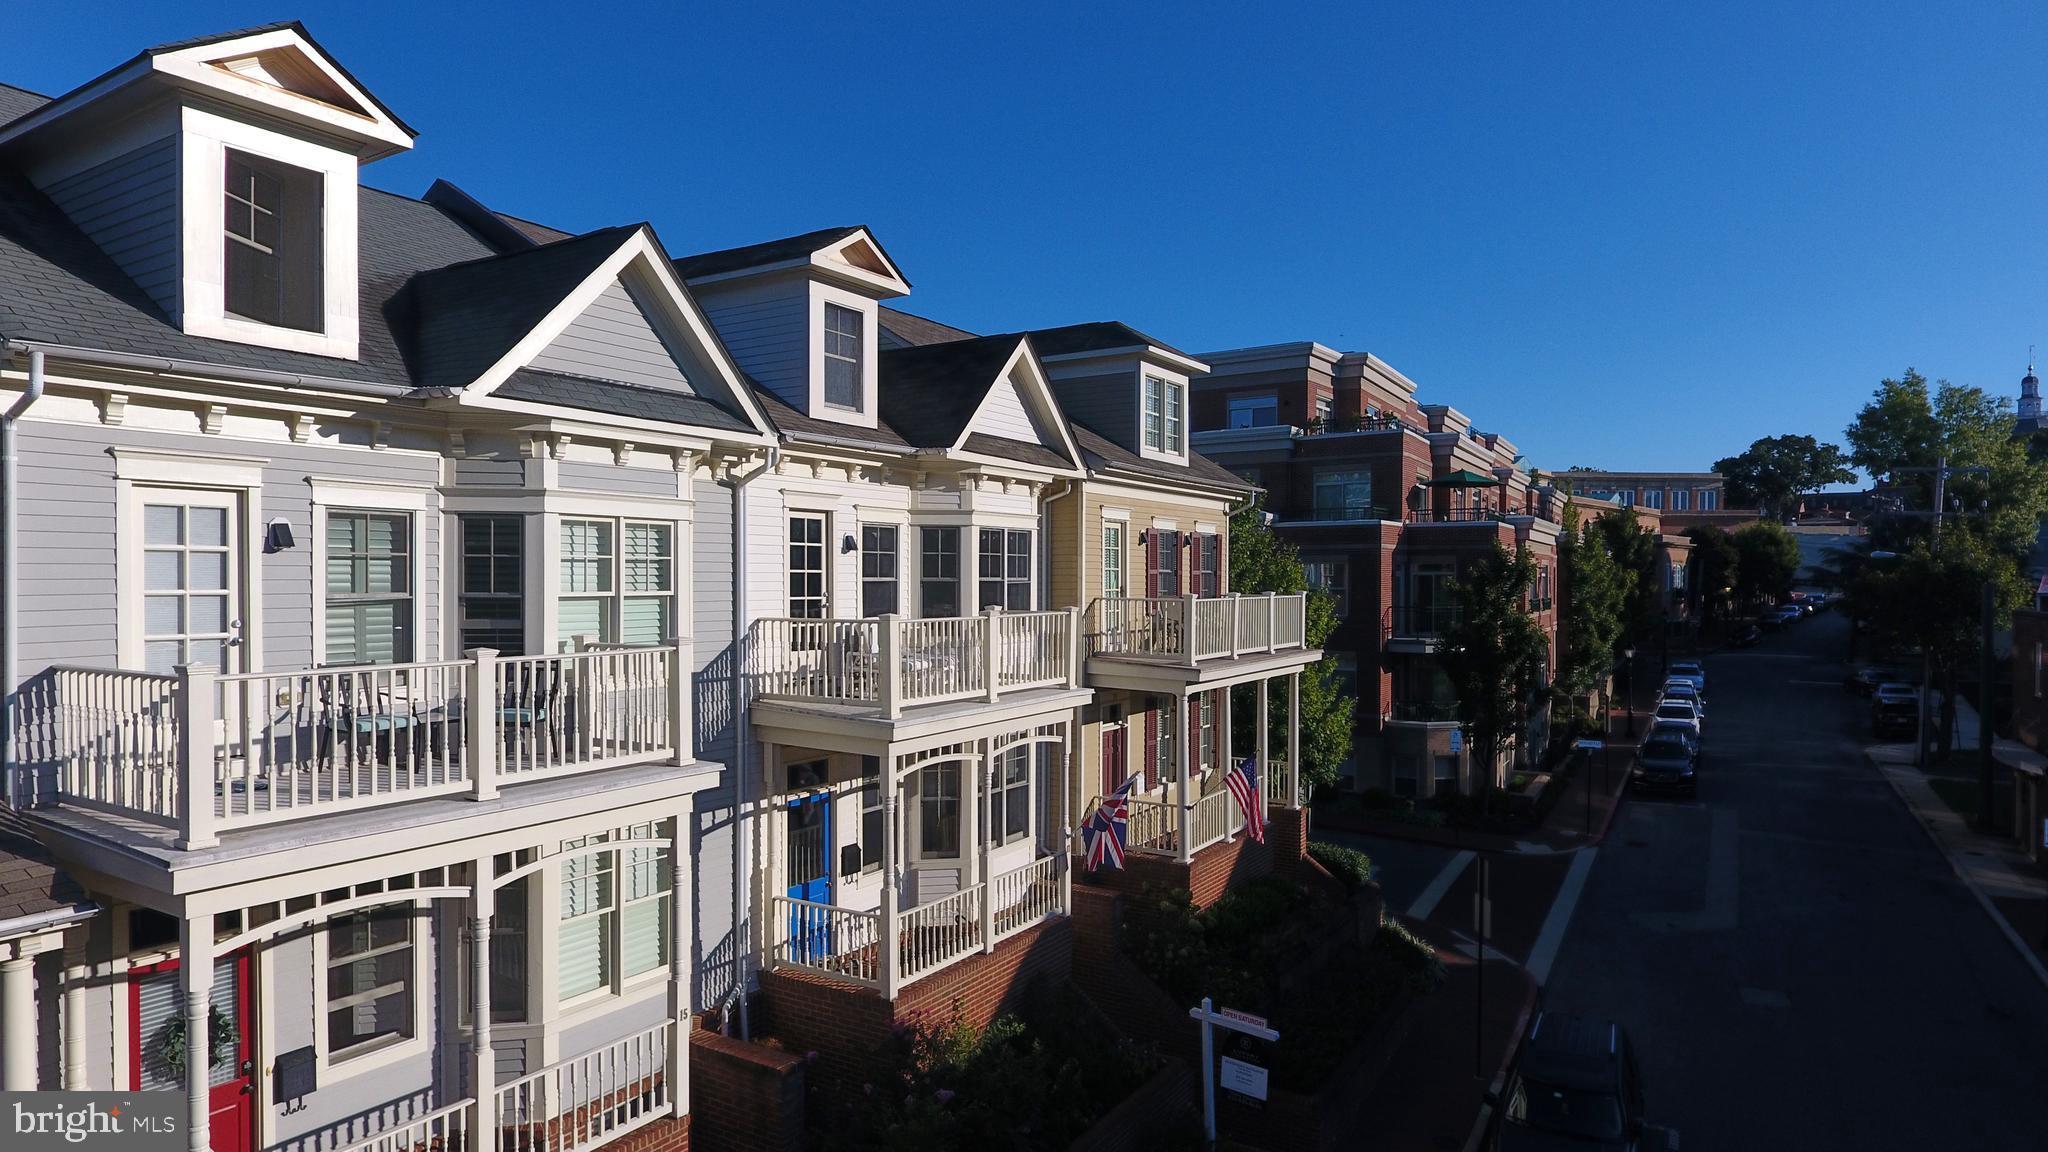 17 S St, Annapolis, MD, 21401